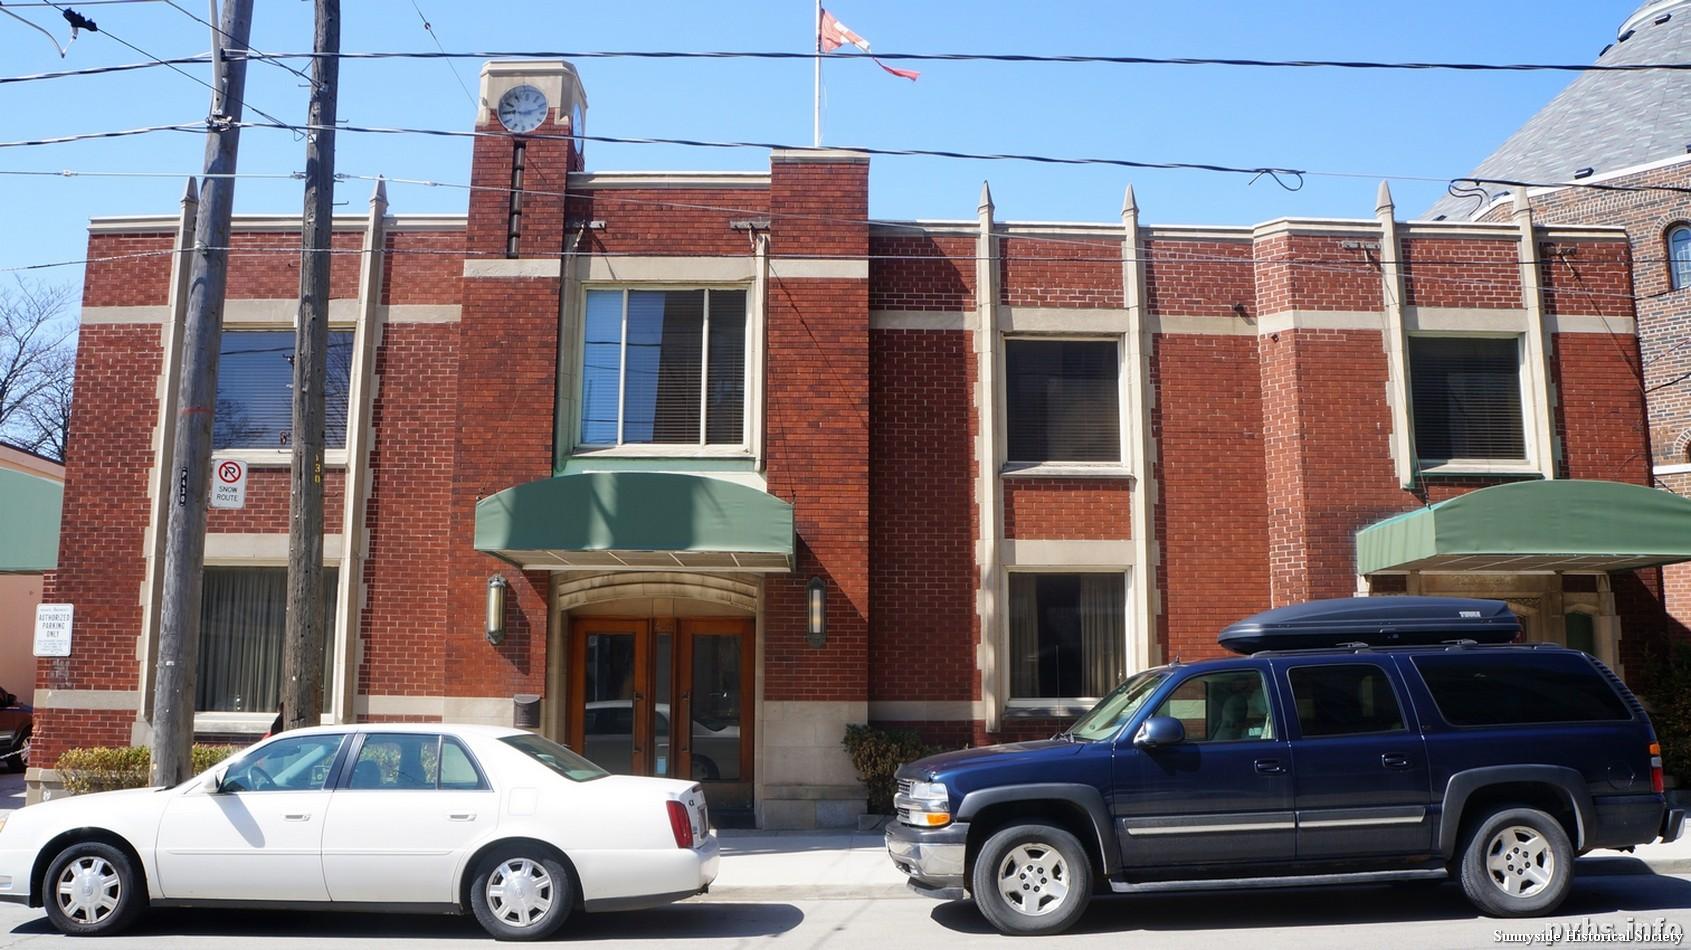 421 Roncesvalles Ave Needs Heritage Designation